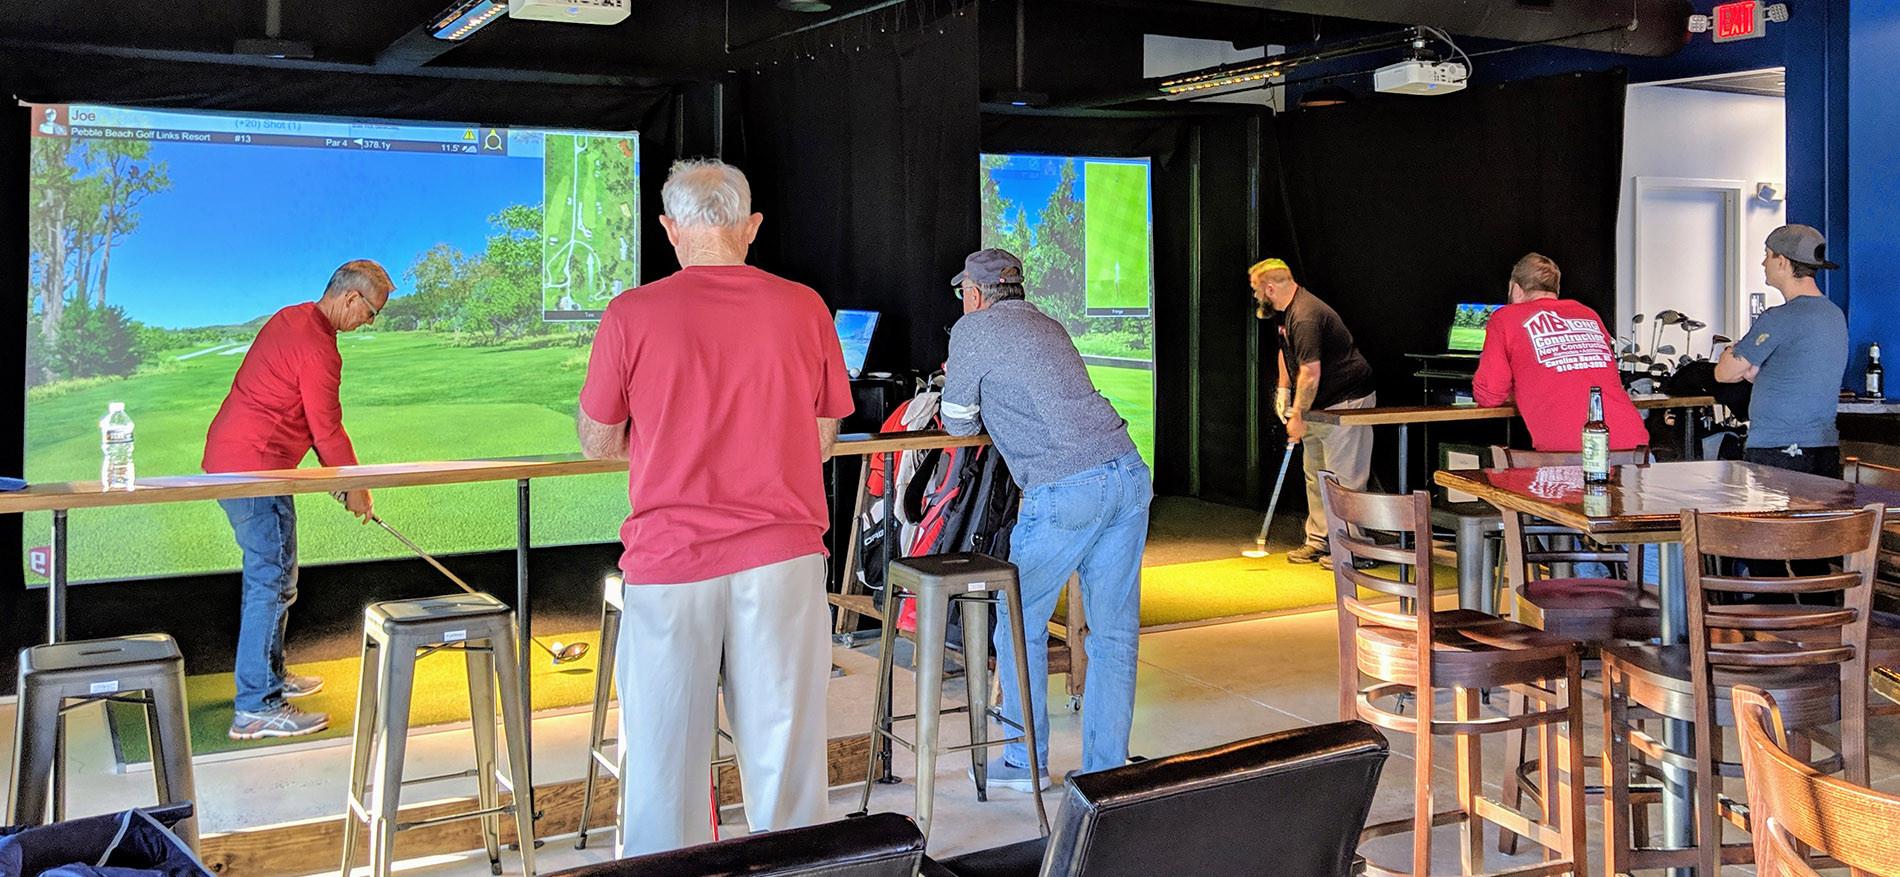 Club_Golf_Indoor_Simulators.jpg